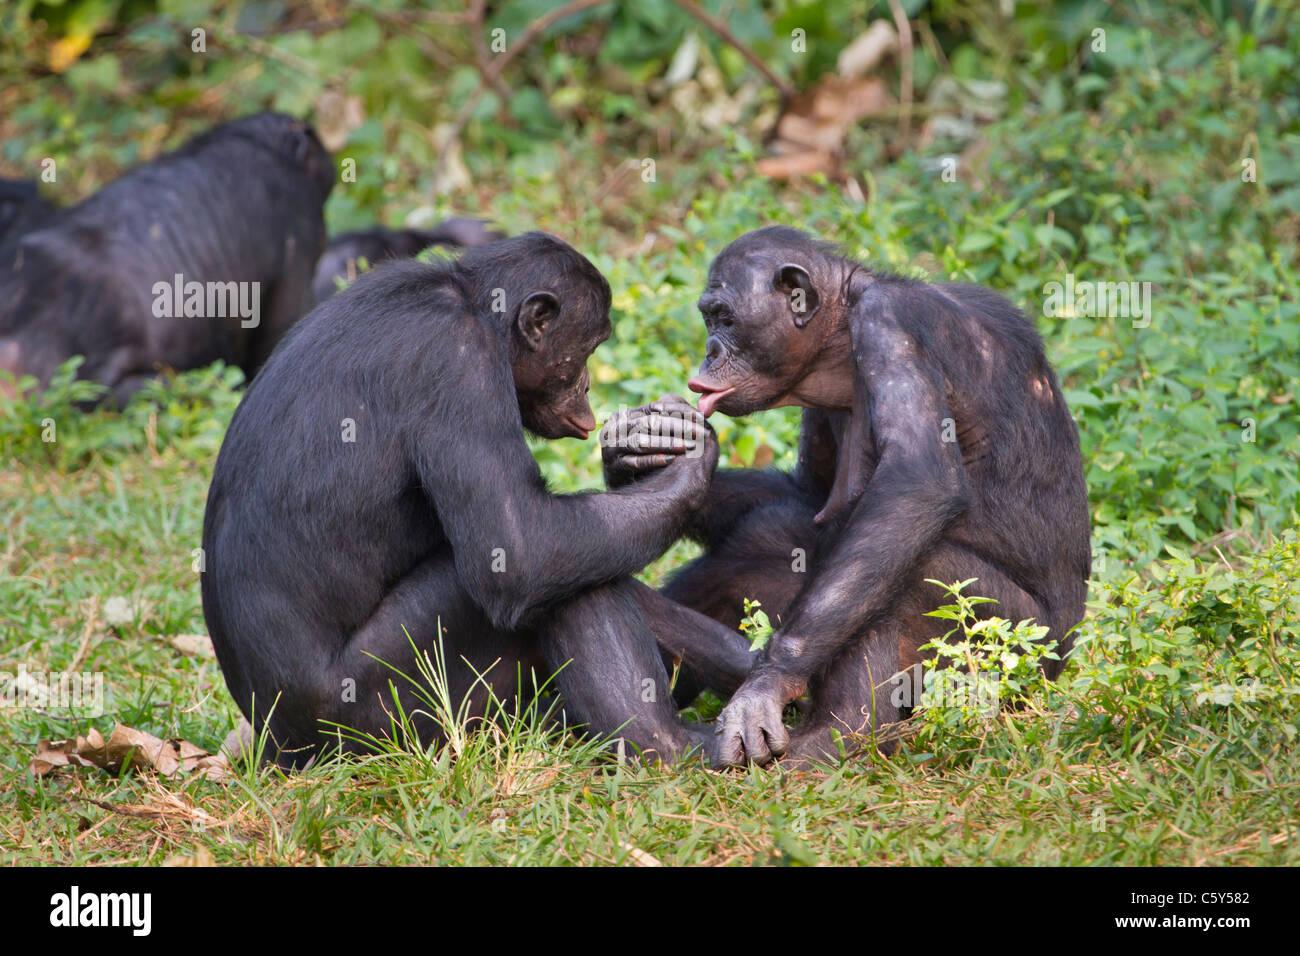 Bonobo (Pan) de lucha panicus haciendo mano, D.R. Congo. Imagen De Stock